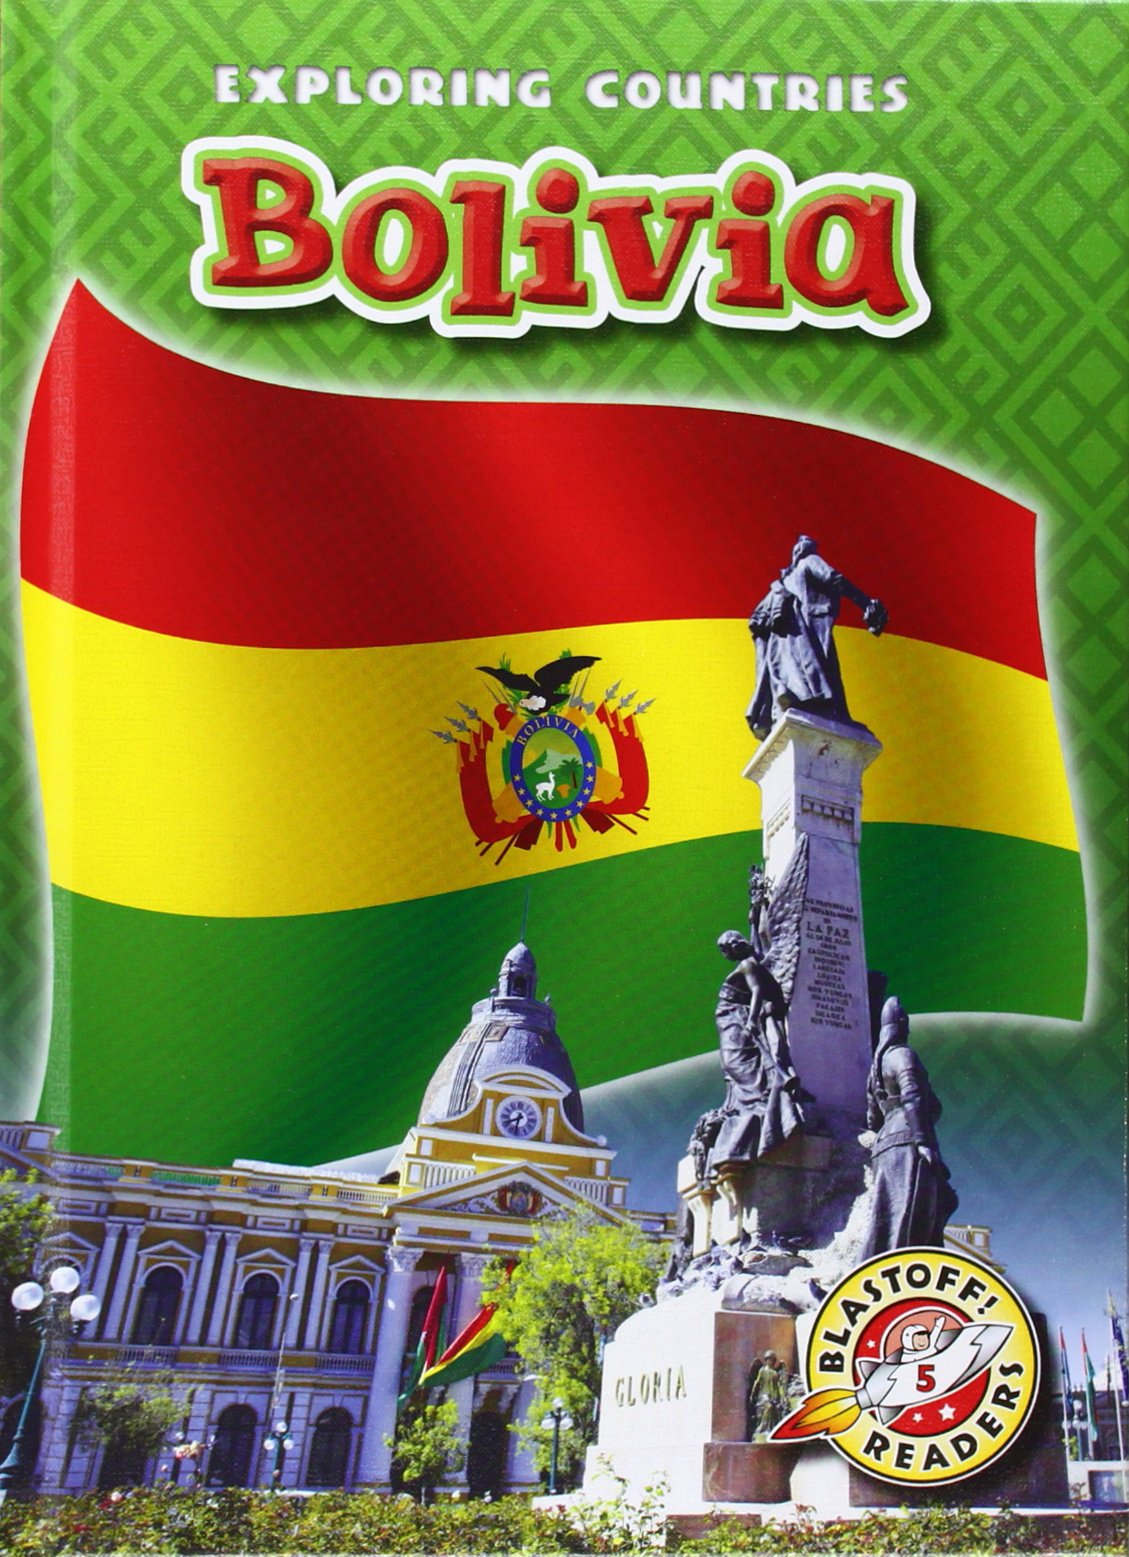 Bolivia (Blastoff Readers: Exploring Countries) (Blastoff! Readers, Level 5)